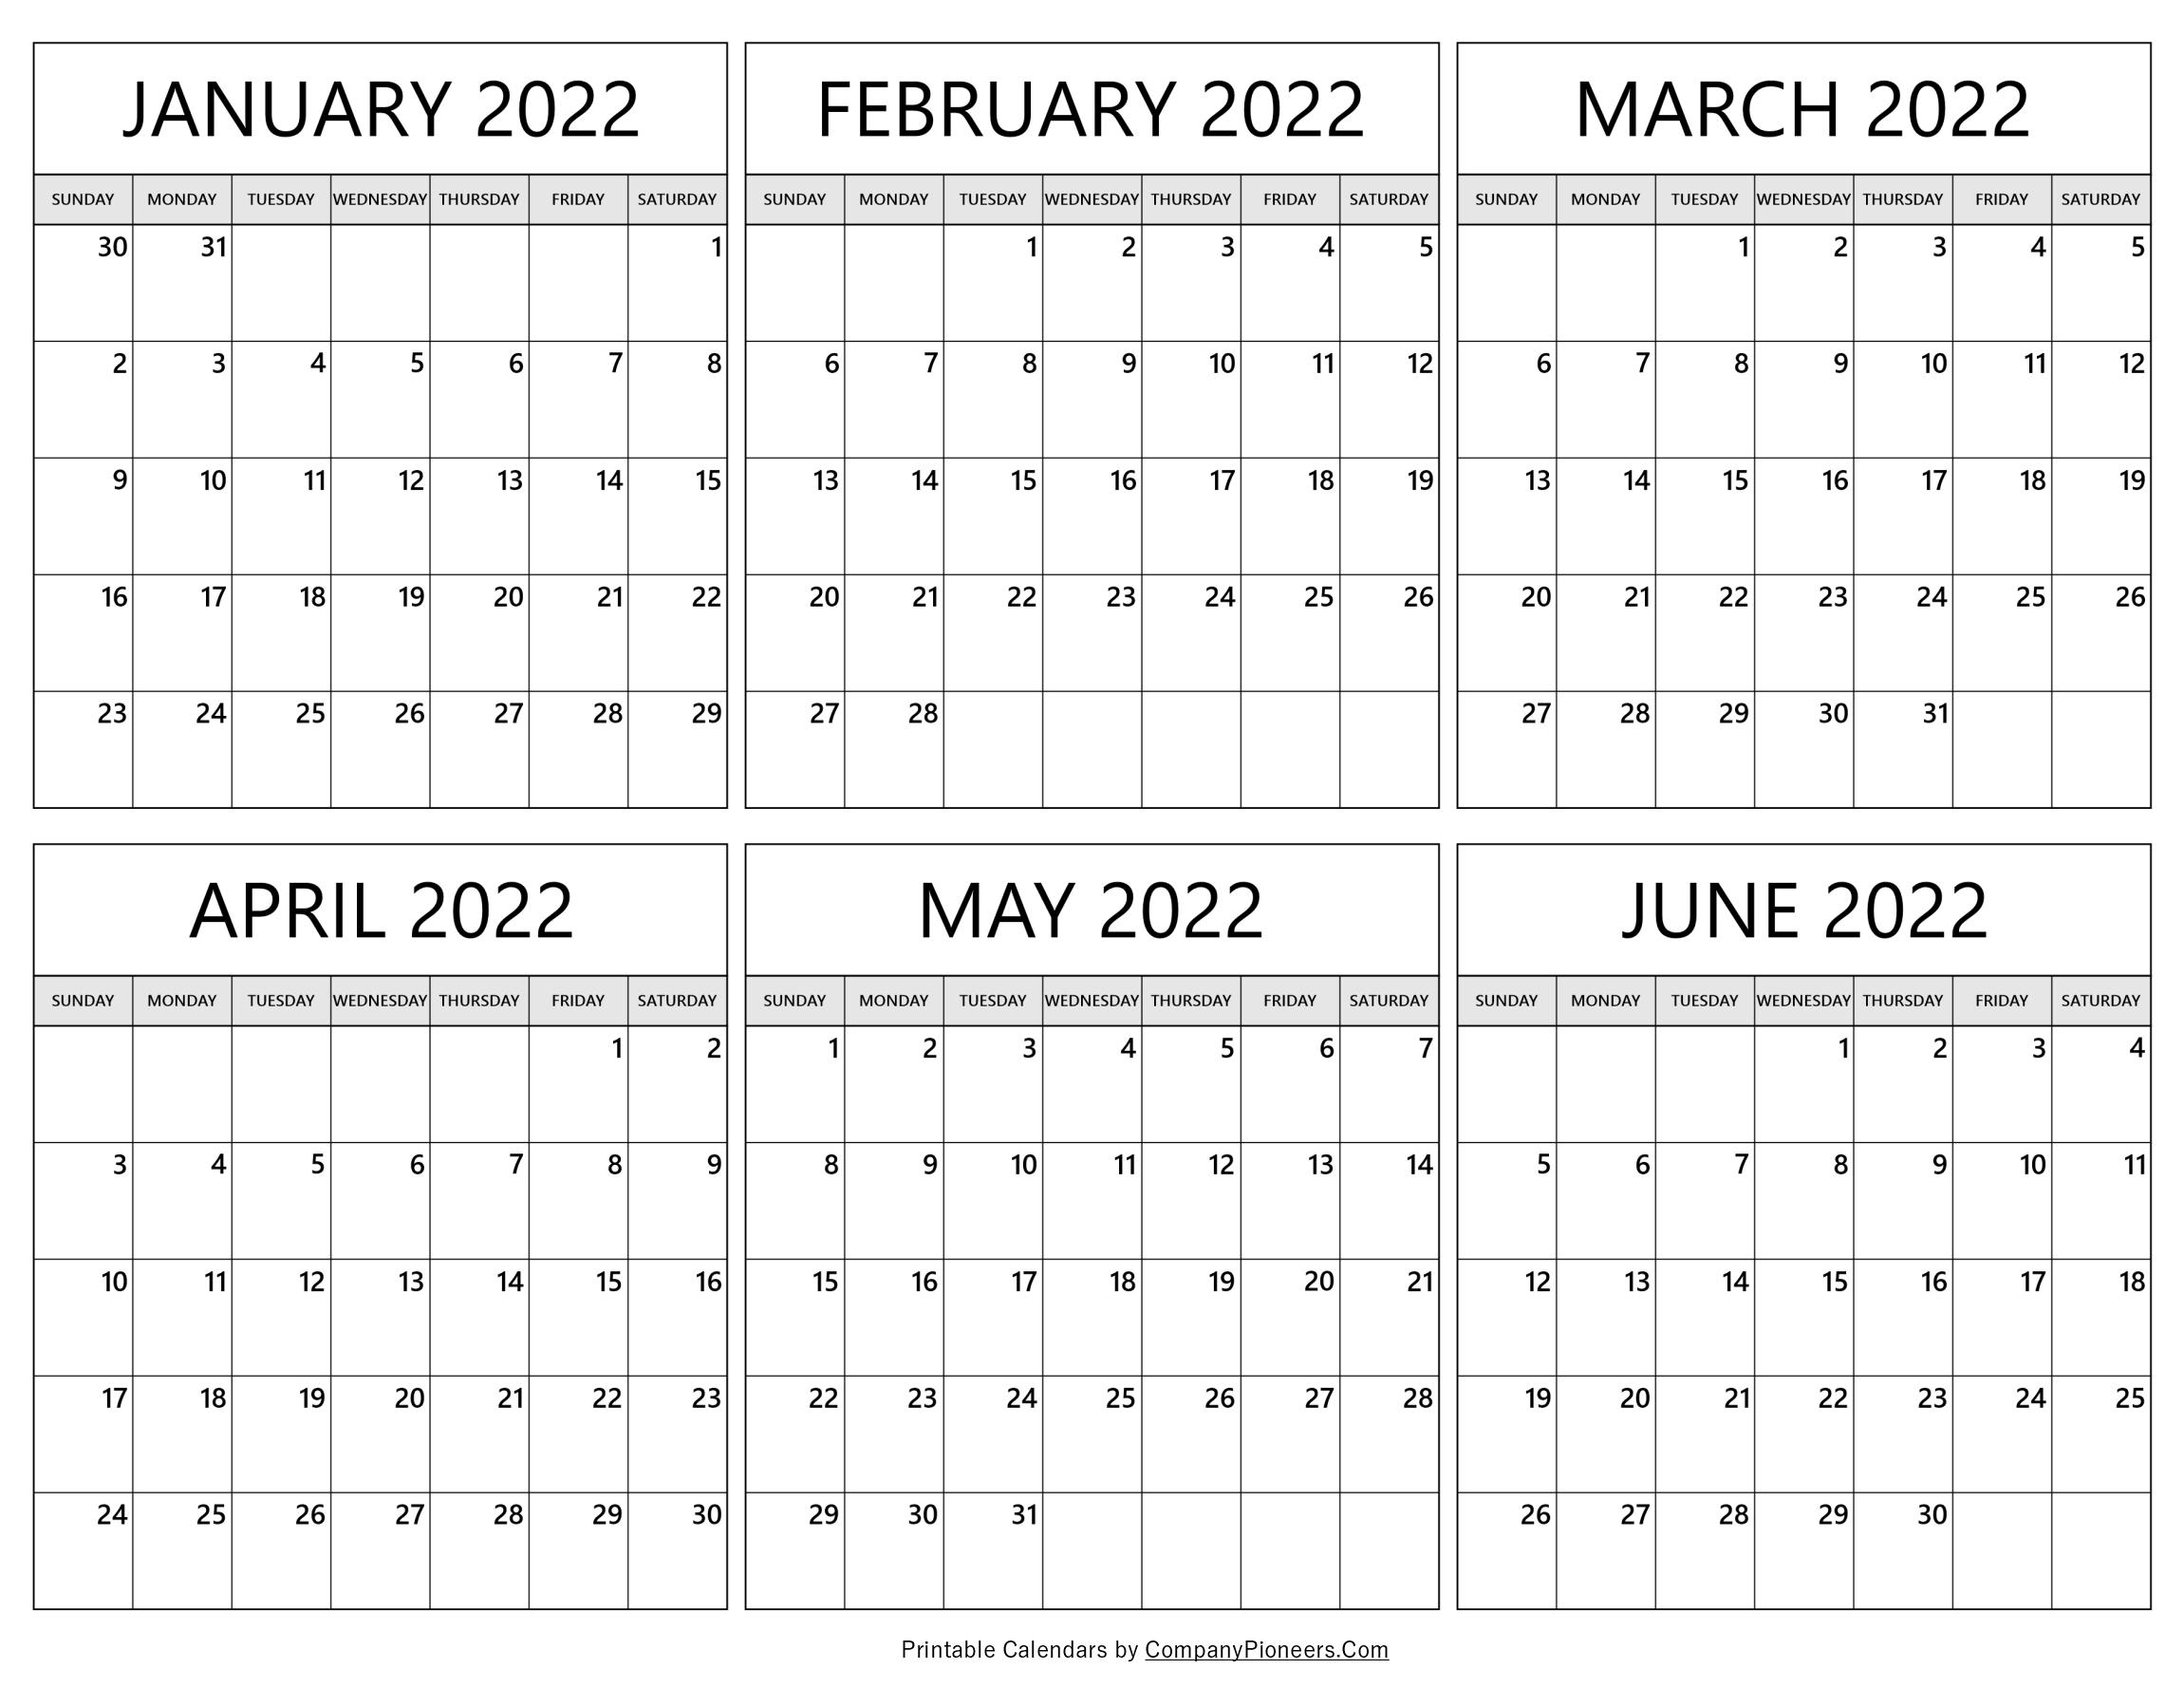 January 2022 to June 2022 Calendar